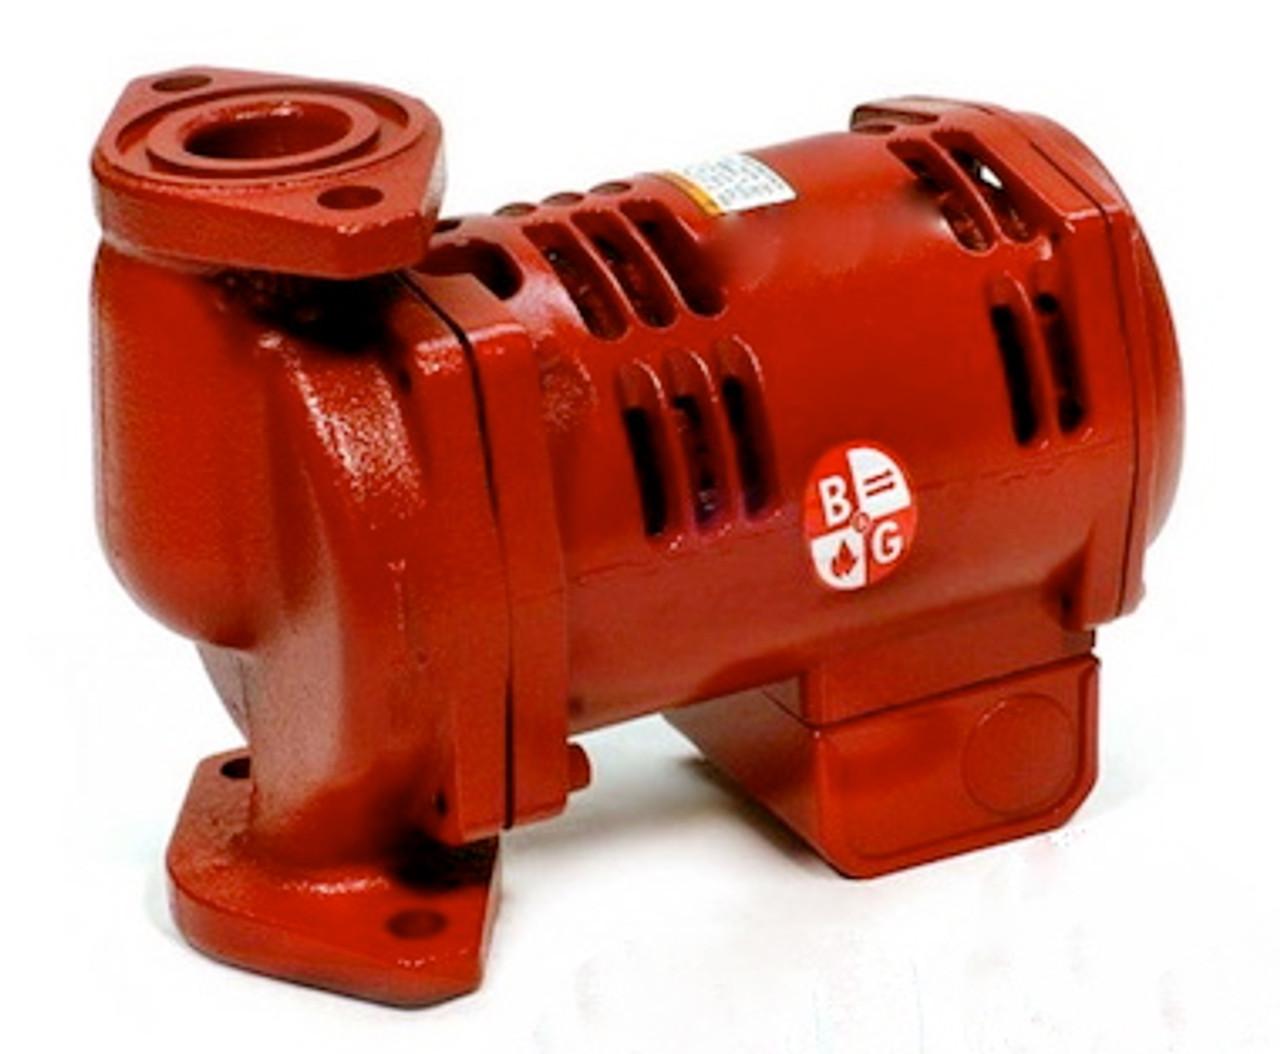 hight resolution of 1bl002 bell gossett pl 45 pump national pump supply bell gossett wiring diagram